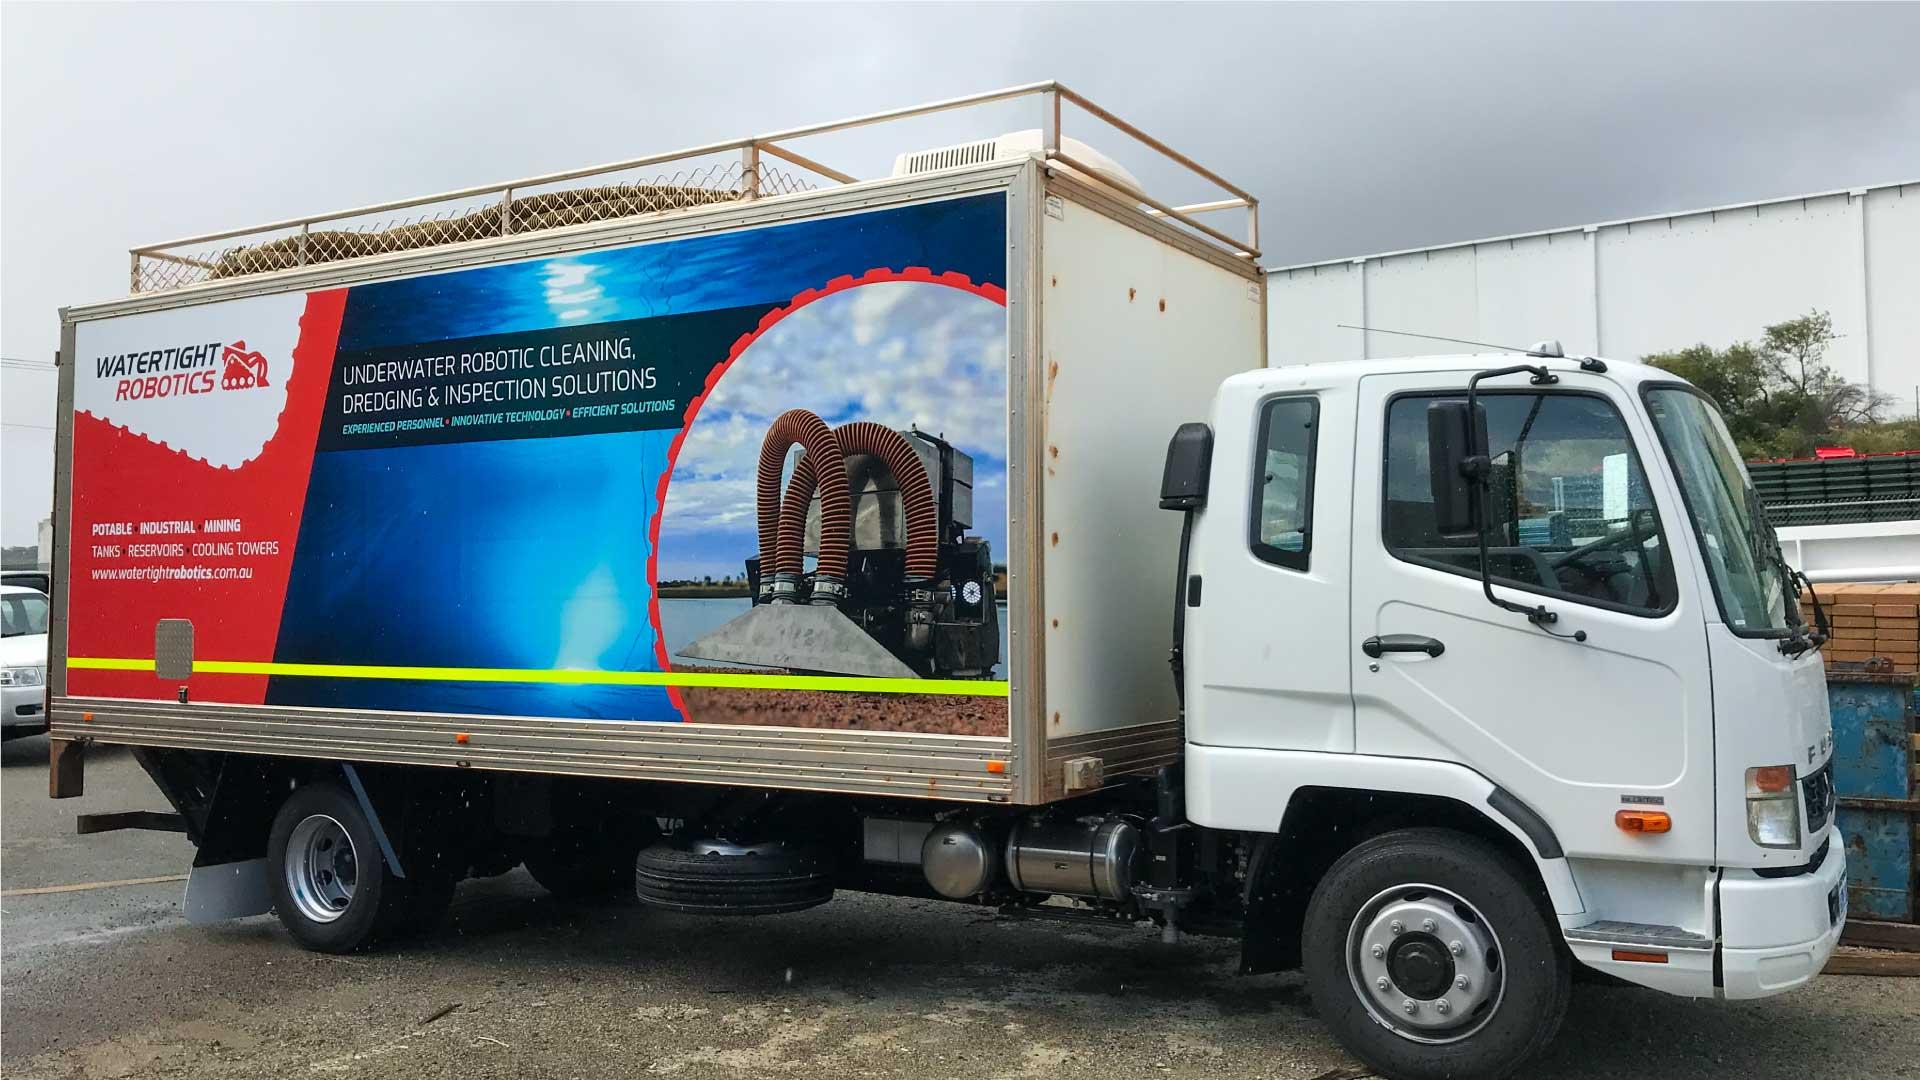 truck signage design watertight robotics perth